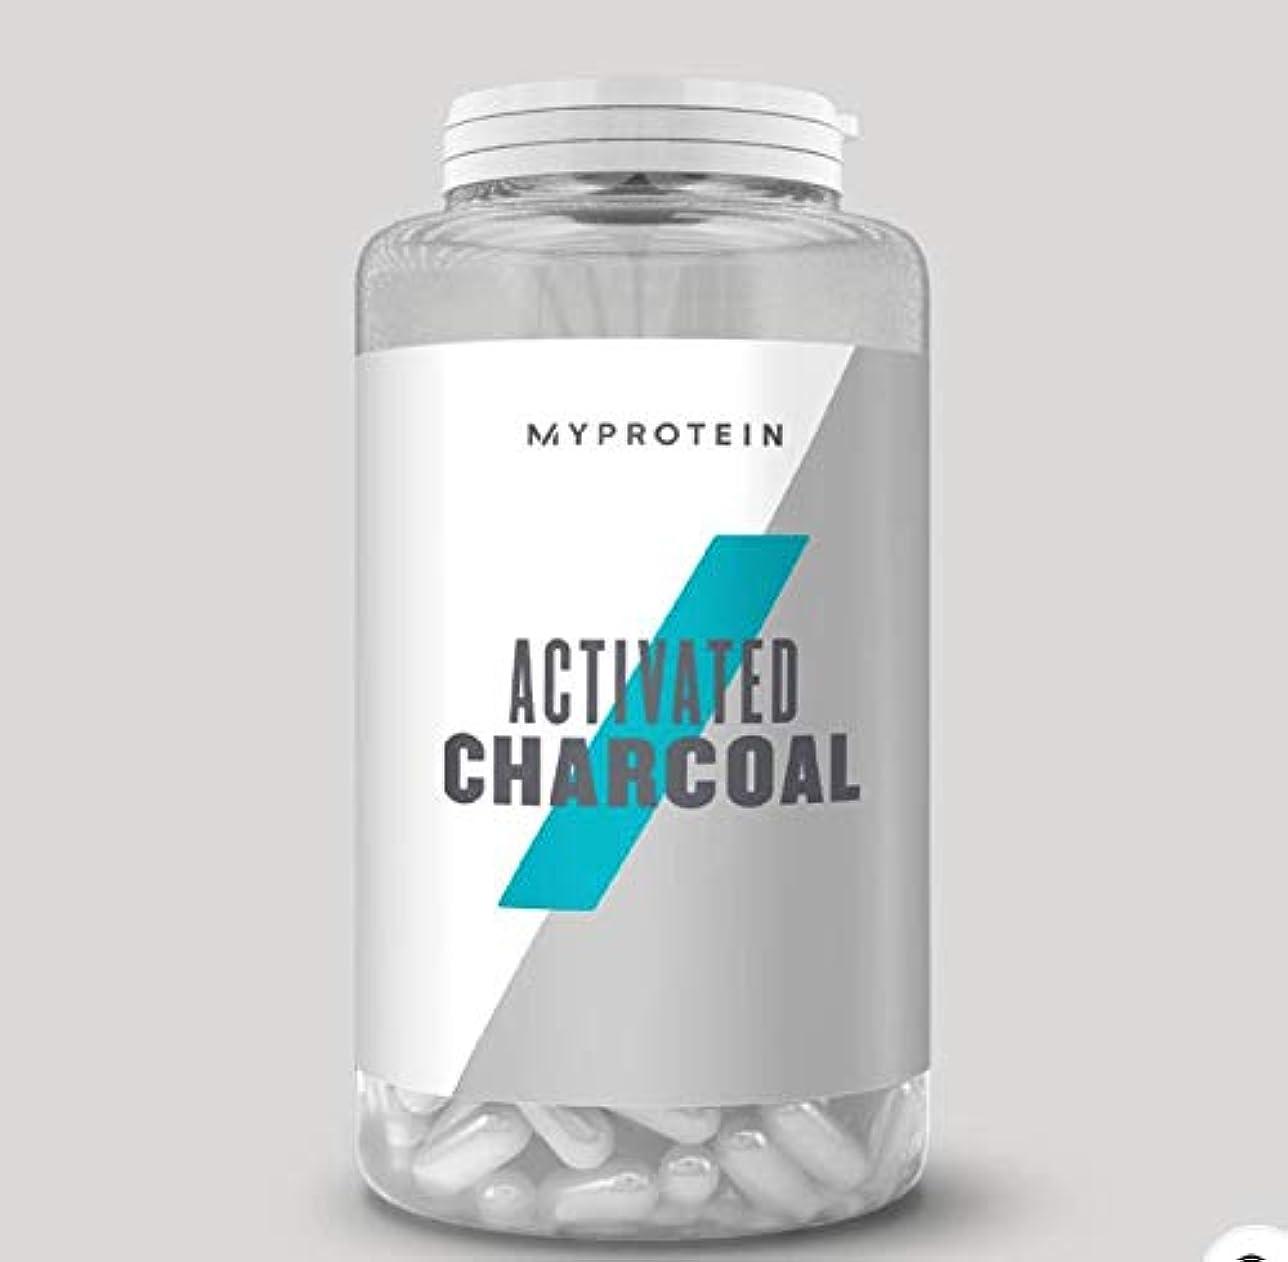 MAIPUROTTEINN マイプロテイン 活性炭 90錠 ダイエットサプリ